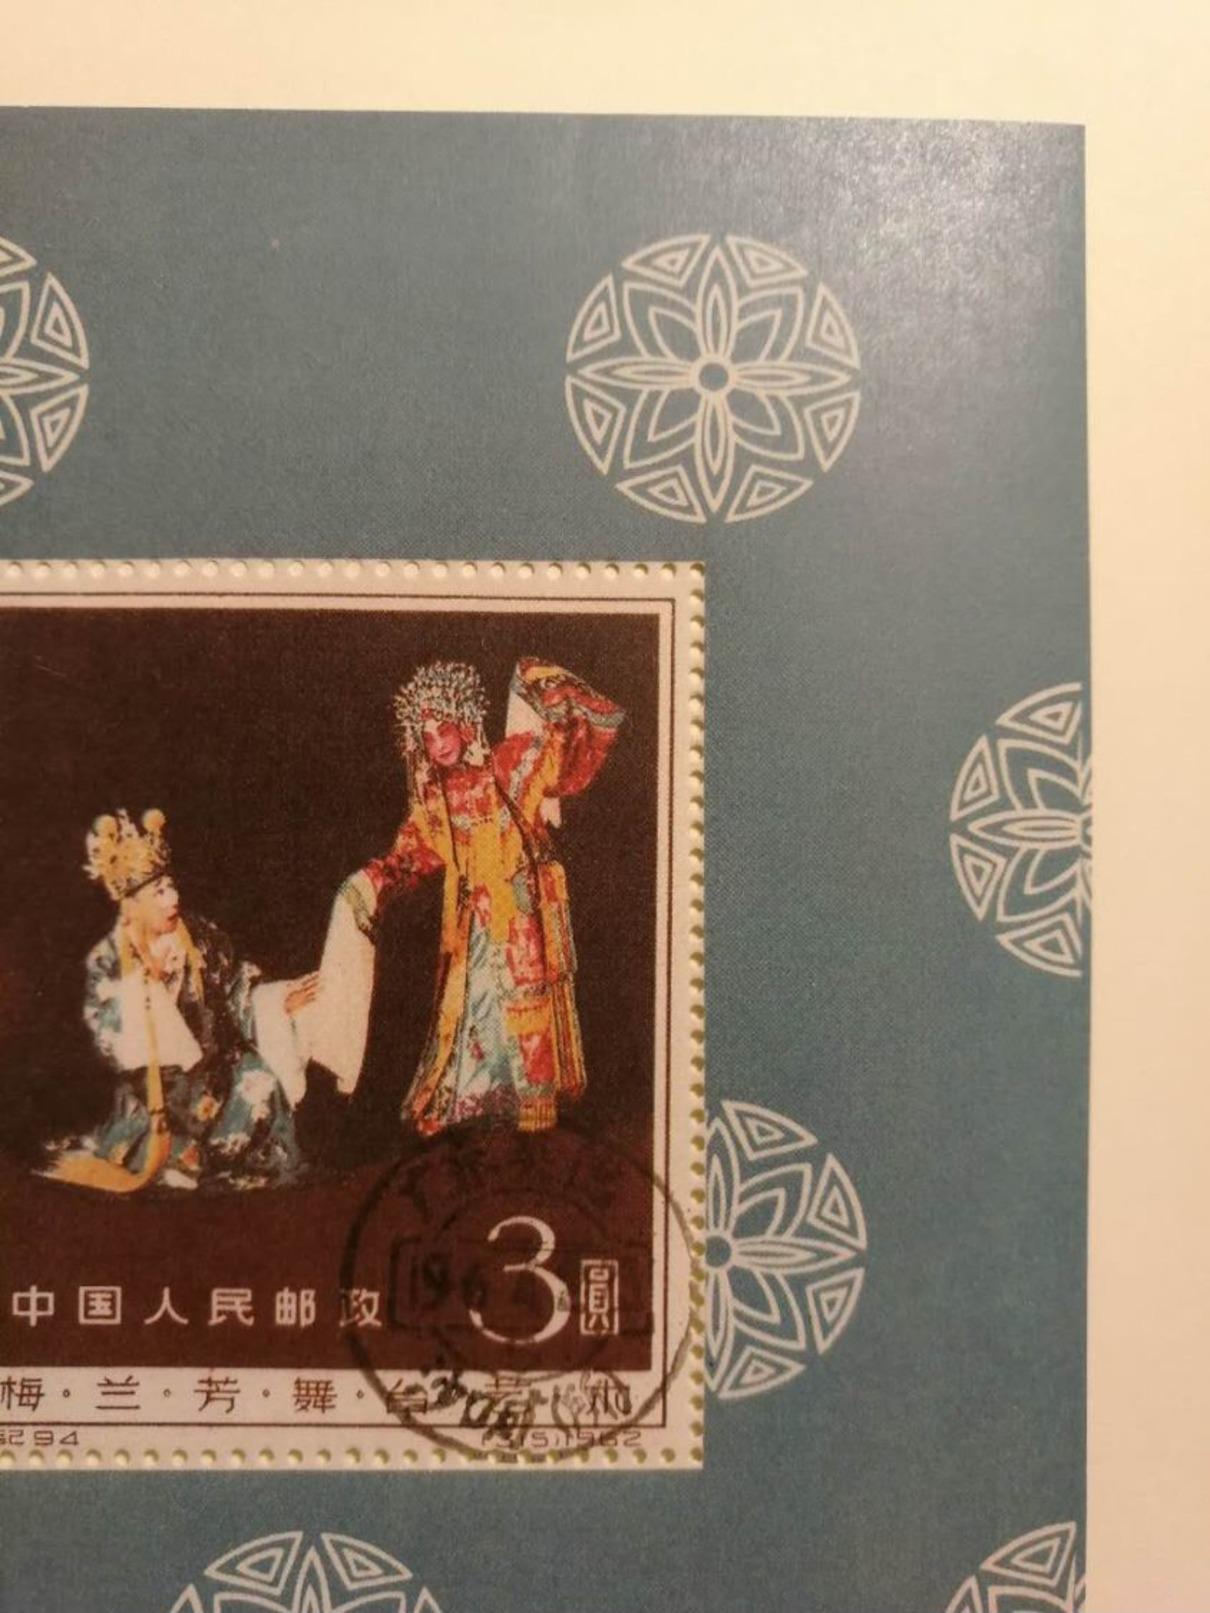 China PRC 1962 Briefmark J. 94 Stage Art Stamp 3 Yuan Mei Lanfang Asien Post Geläuft - Used Stamps